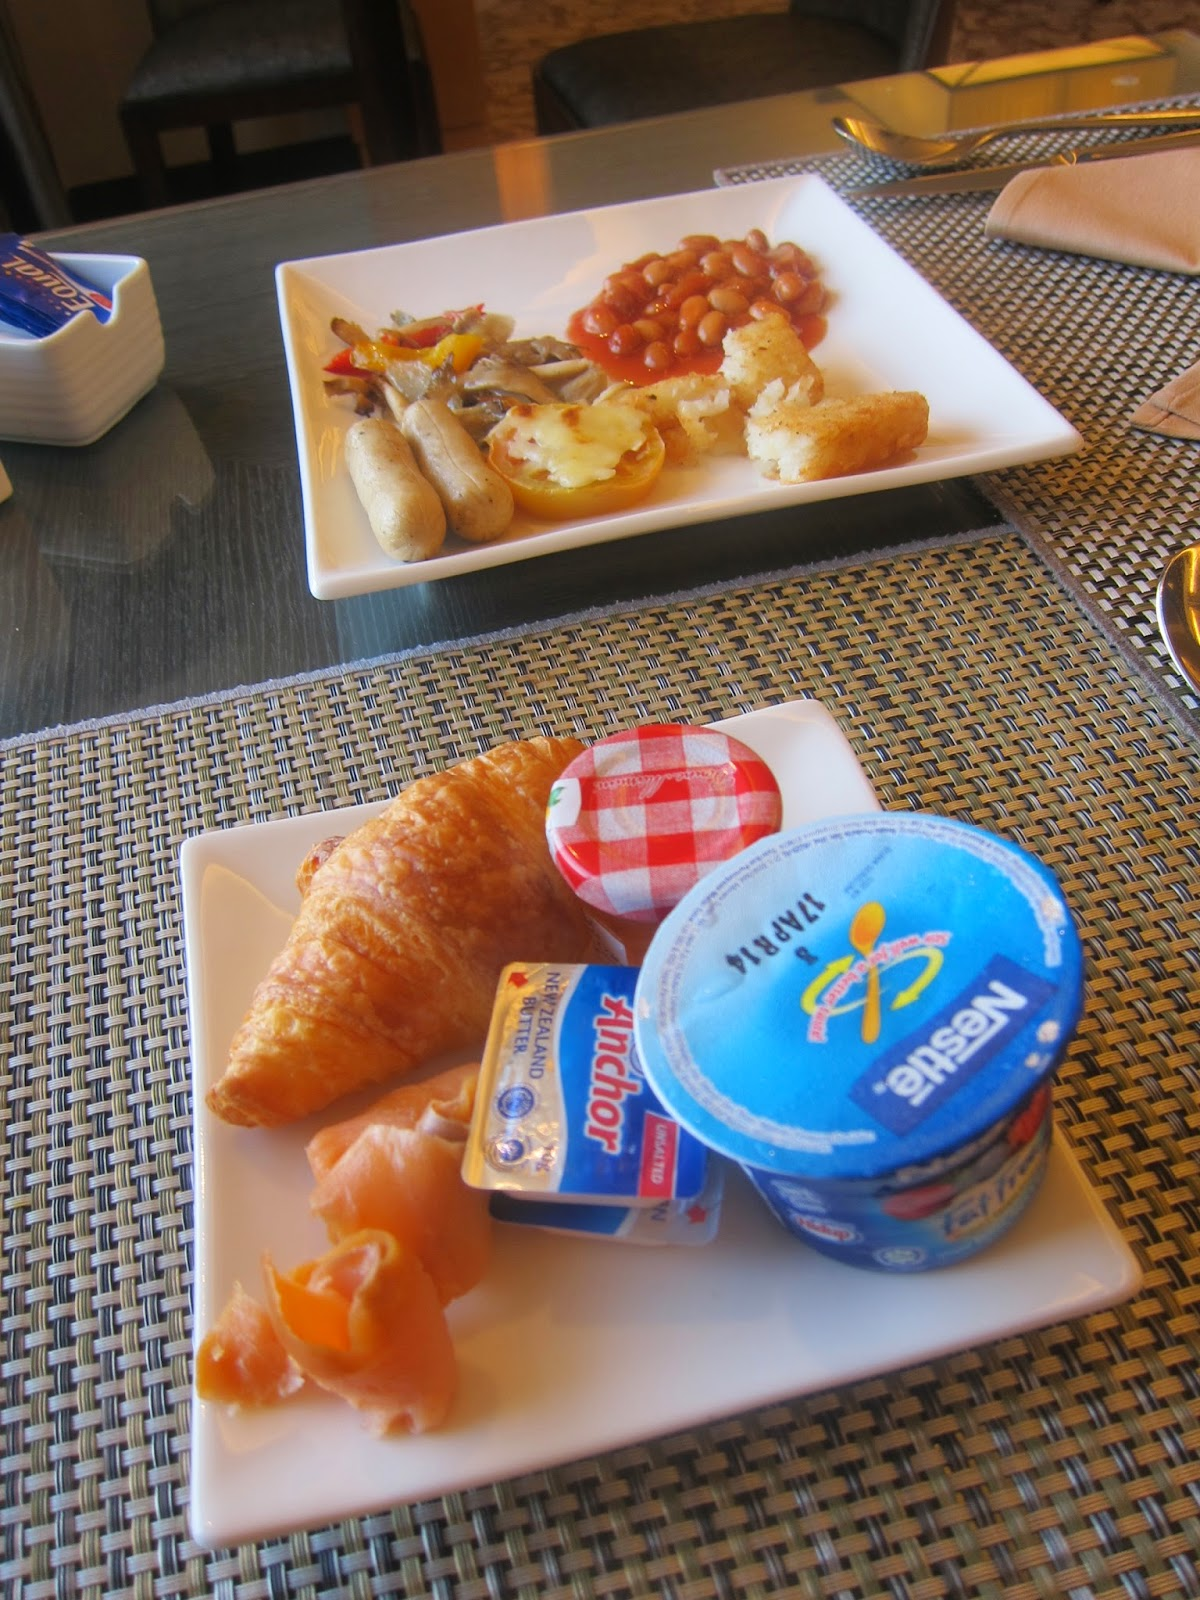 Hilton Petaling Jaya Breakfast Buffet